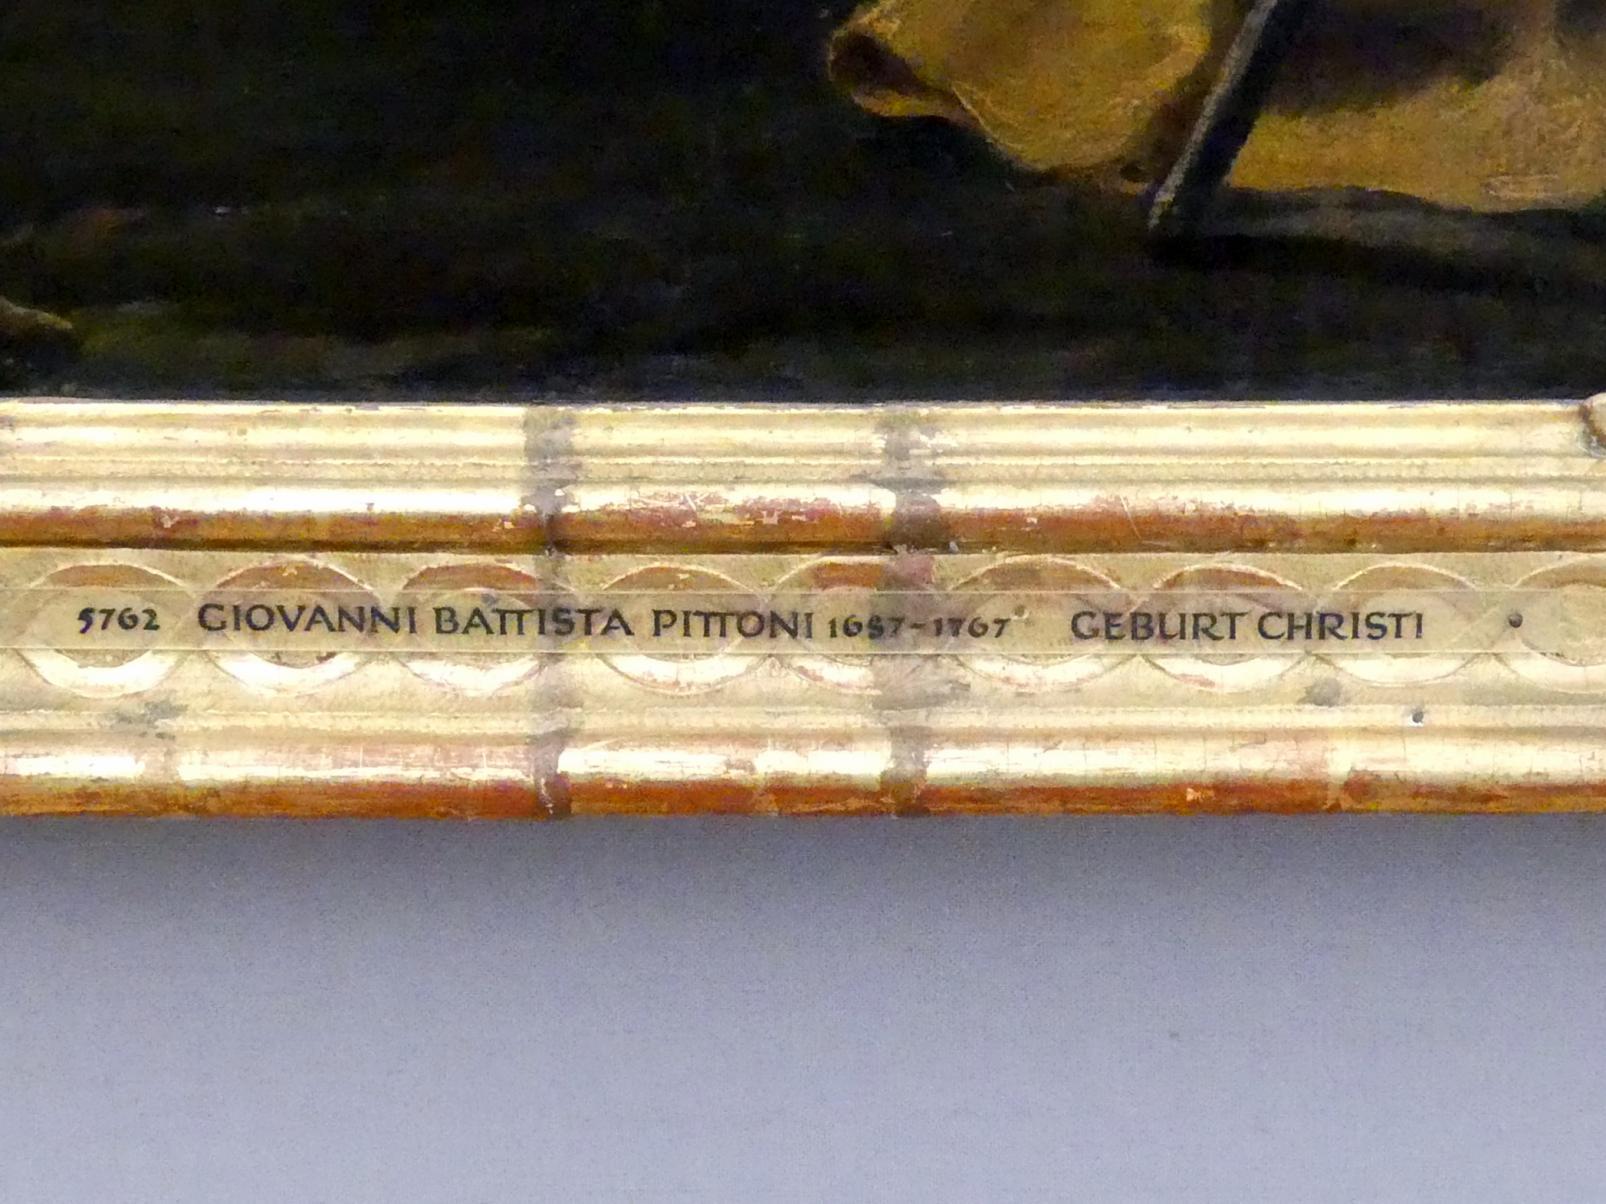 Giovanni Battista Pittoni: Die Geburt Christi, um 1735, Bild 2/2